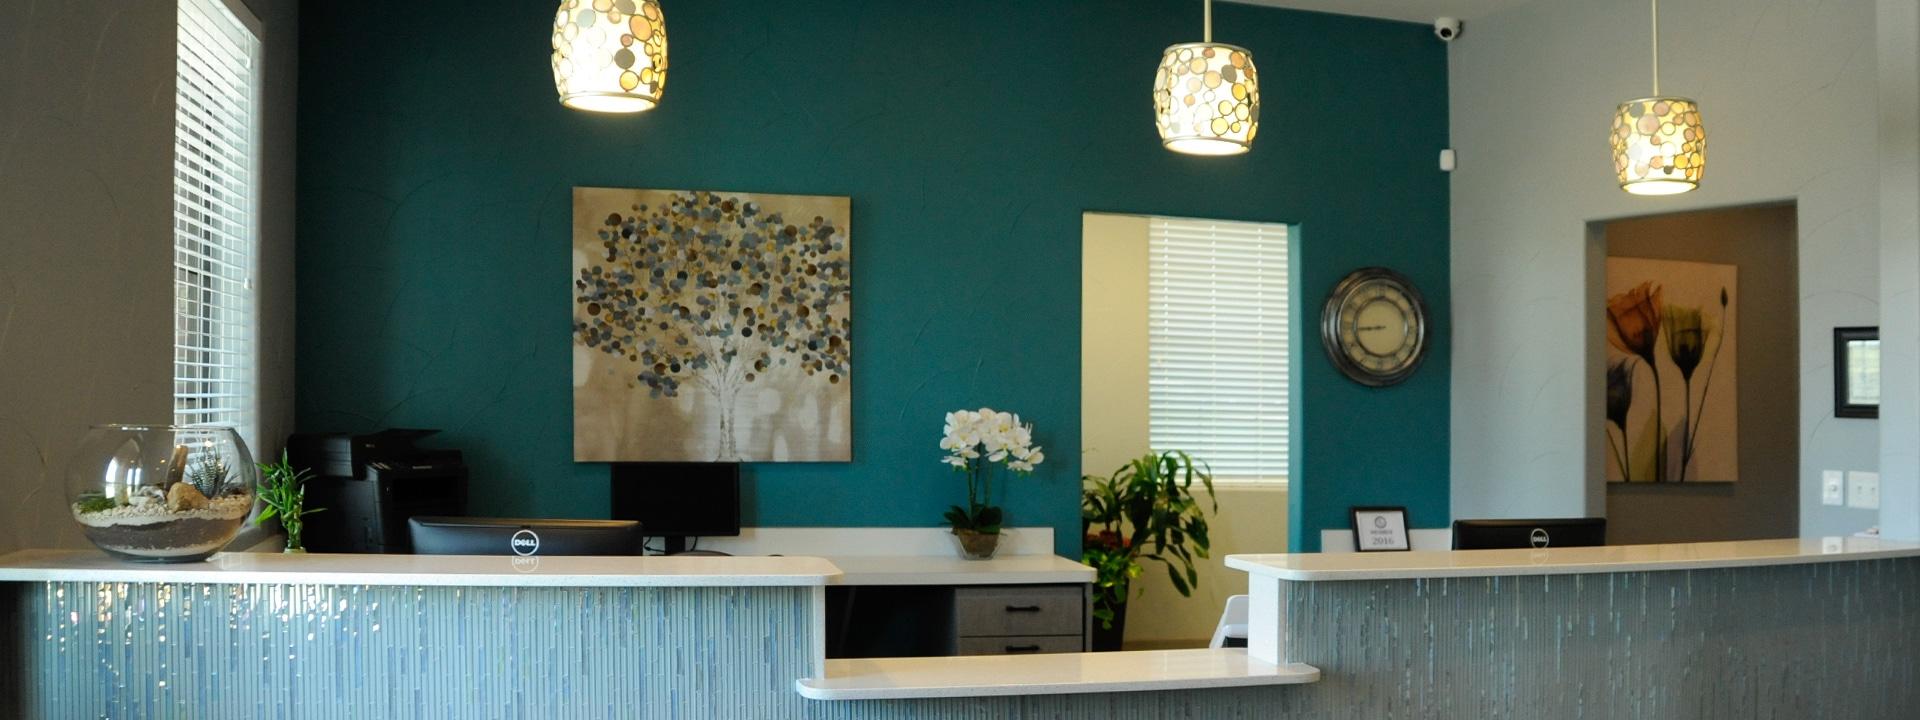 Soothing Dental | Midlothian, TX | General & Family Dentistry